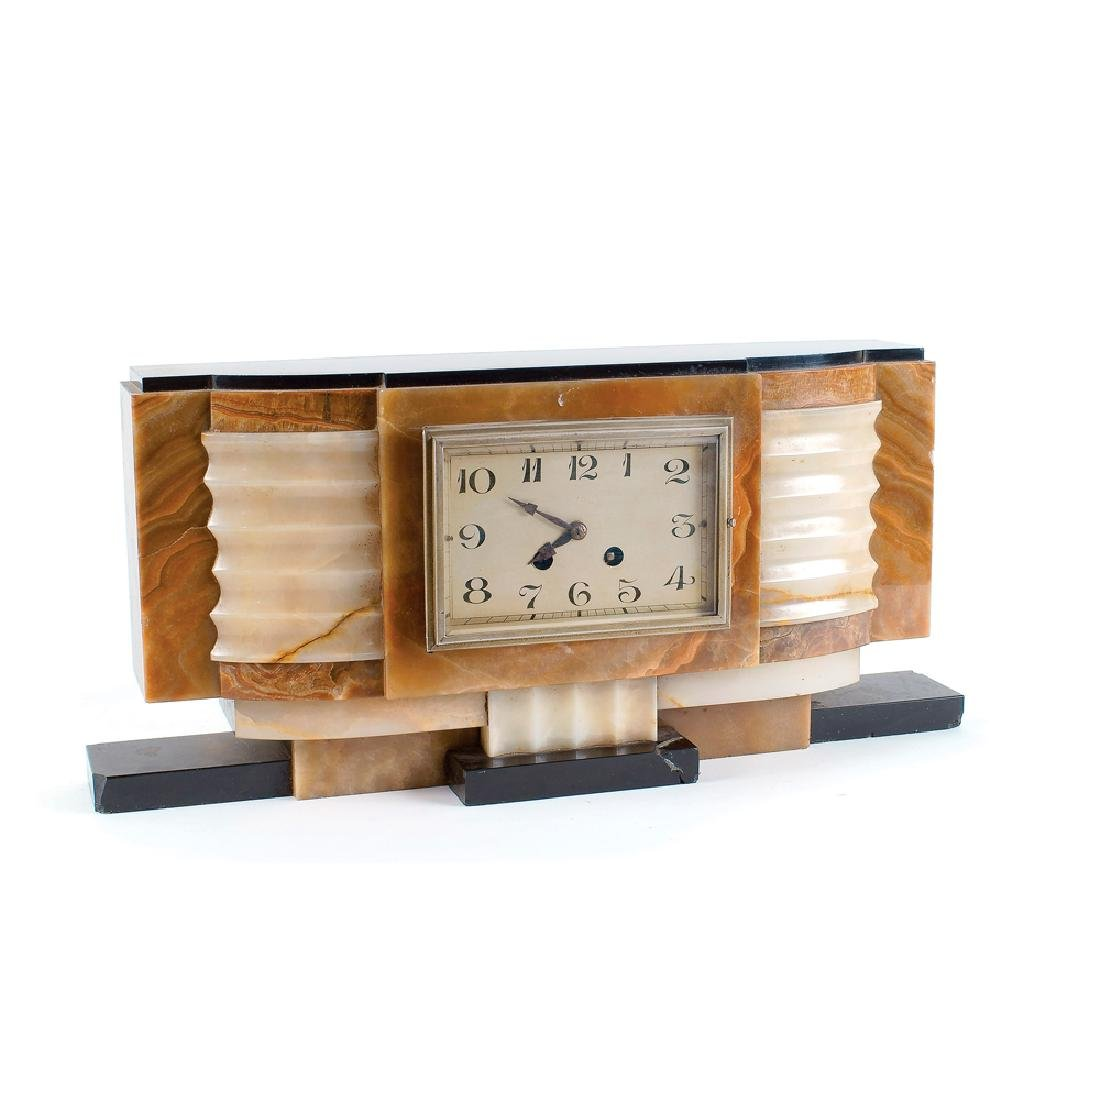 Art Decò table clock France 20th century 22x48x9 cm.